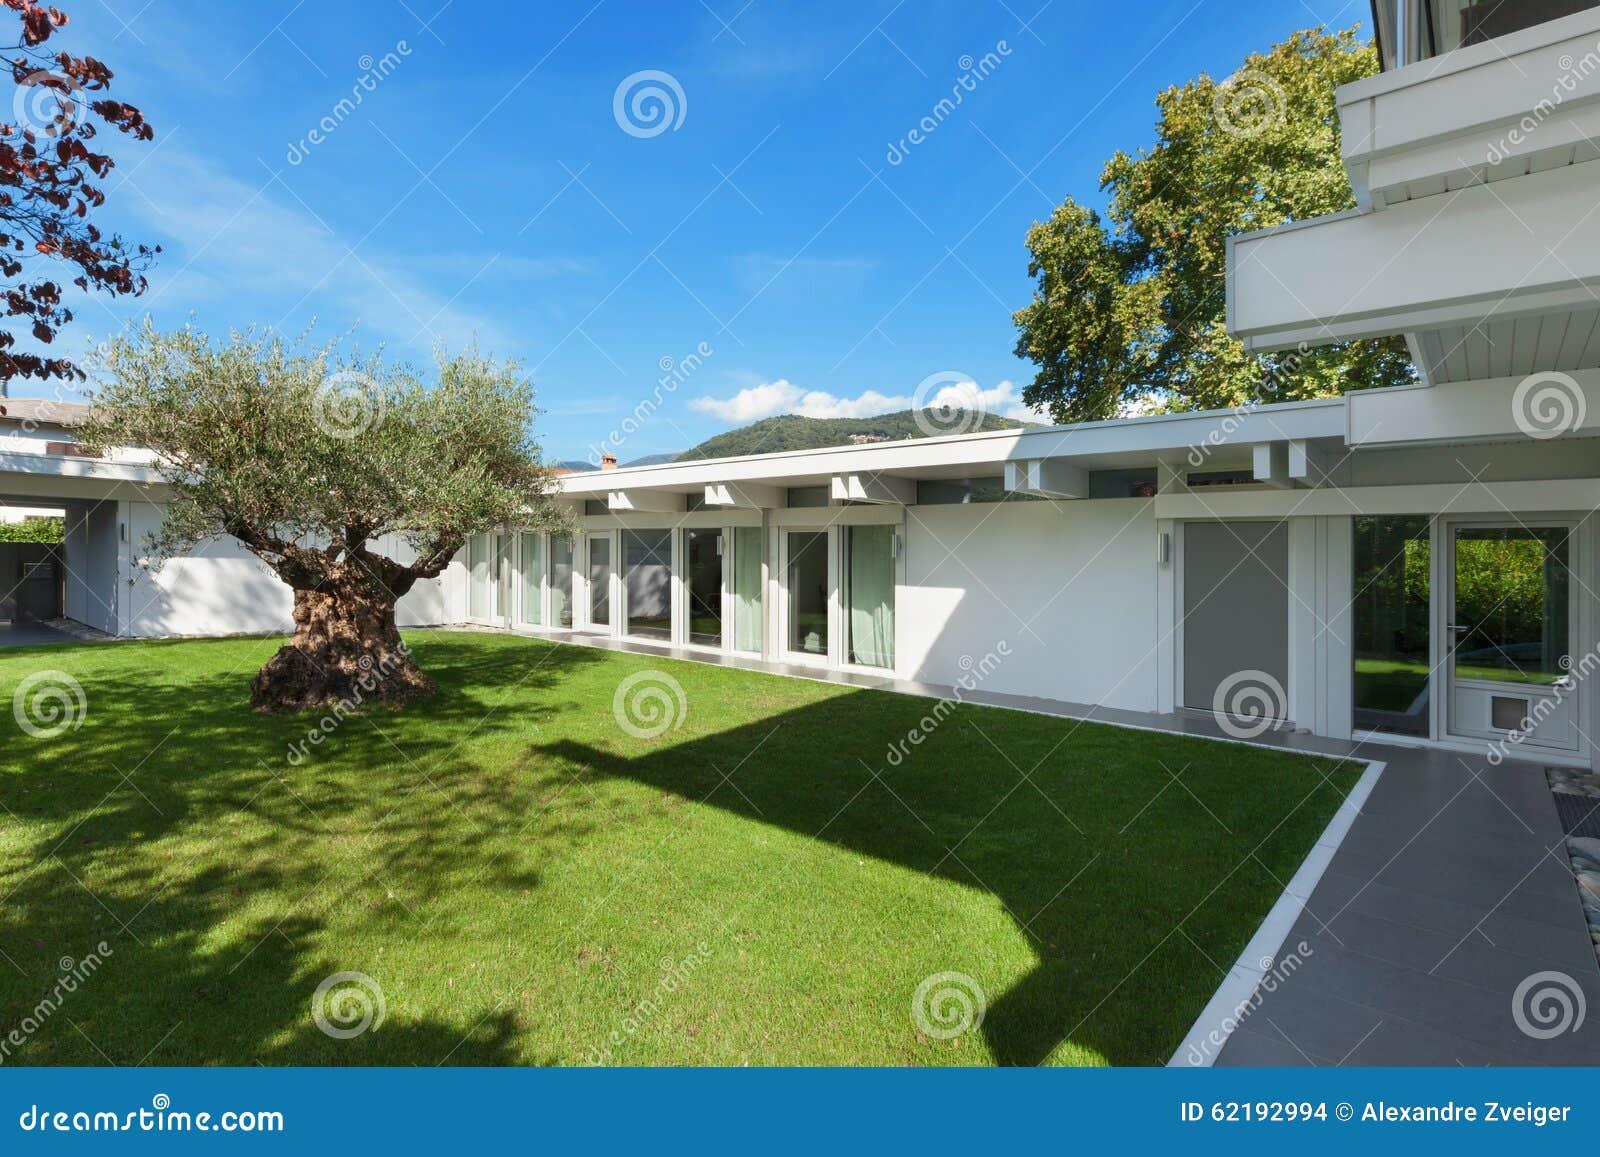 jardin d 39 une maison moderne avec l 39 olivier photo stock image du patrimoine externe 62192994. Black Bedroom Furniture Sets. Home Design Ideas